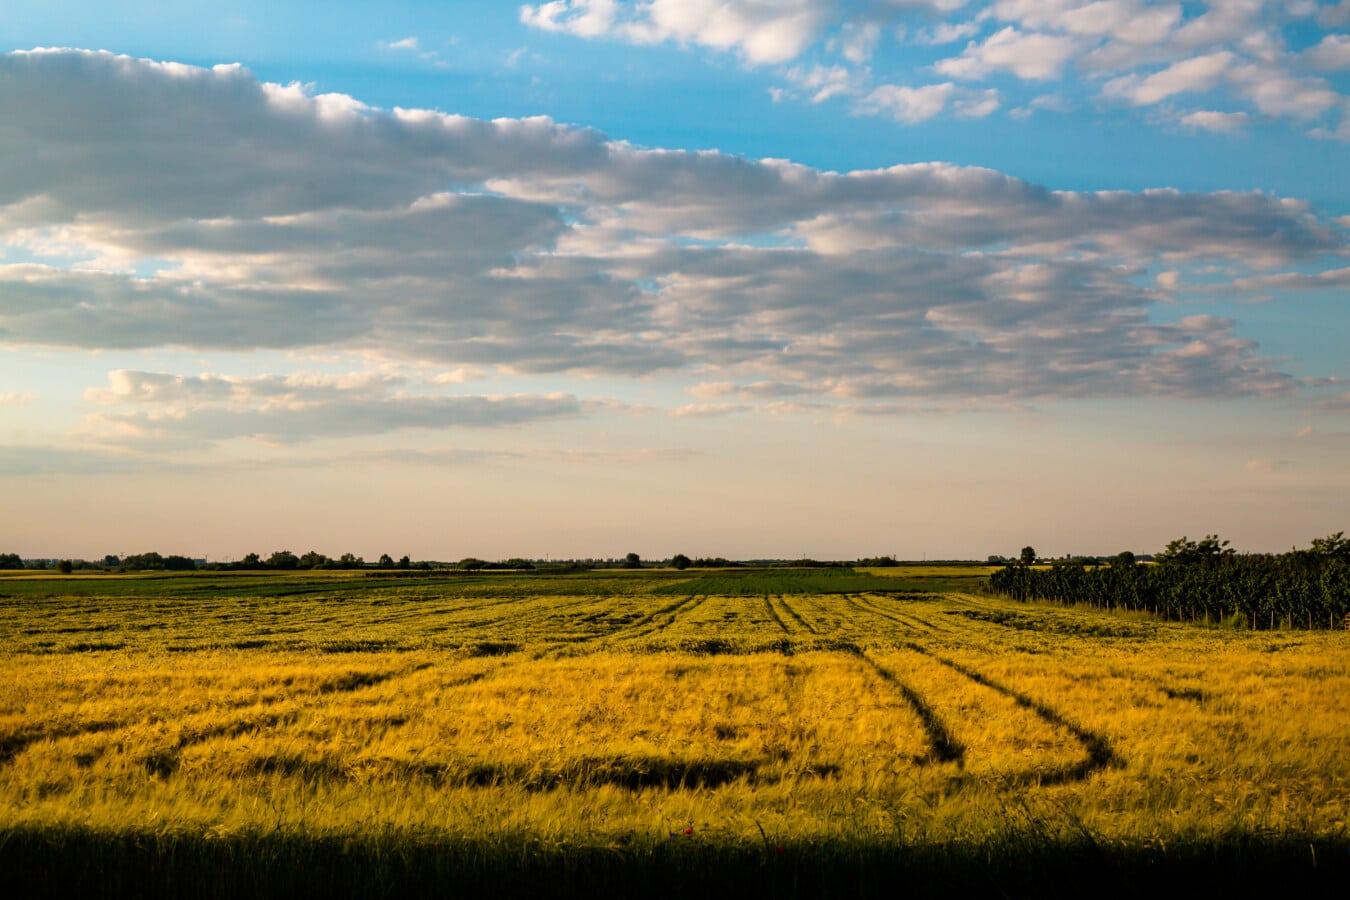 rye, field, sunset, grass, rural, farm, agriculture, meadow, landscape, sun